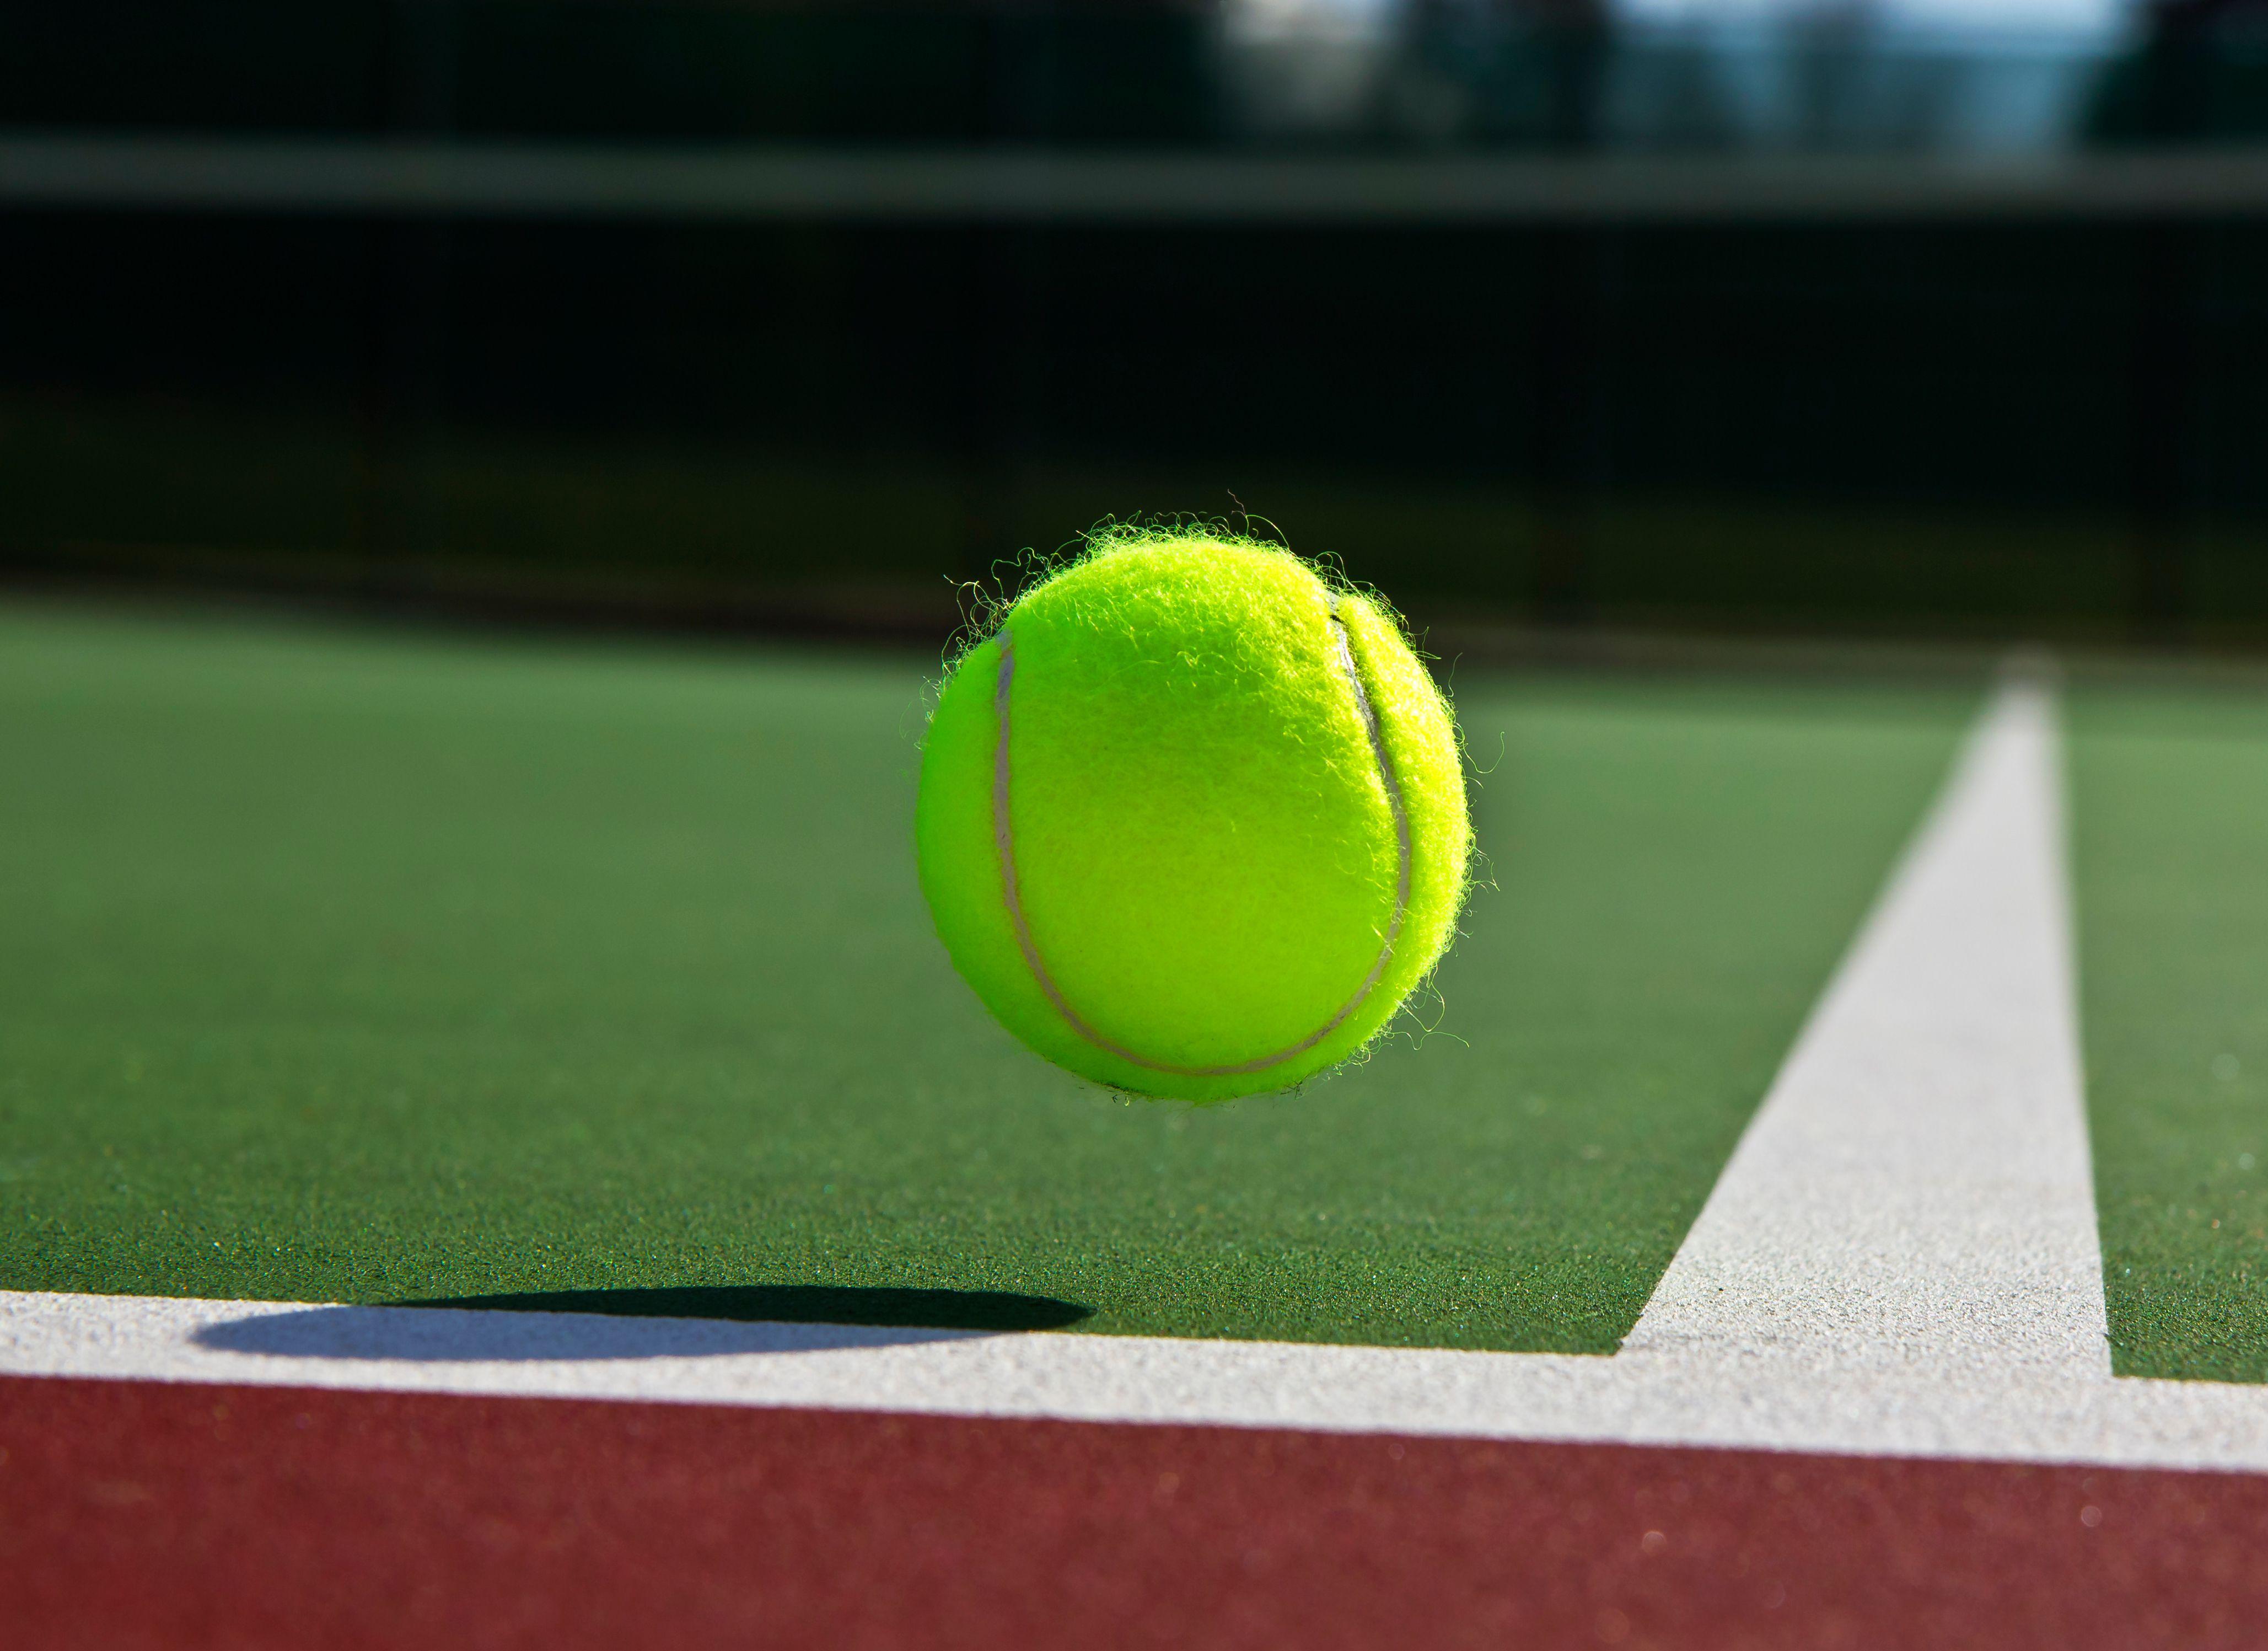 Dr Pimple Popper Pops Tennis Ball Lipoma In Season 4 Ep